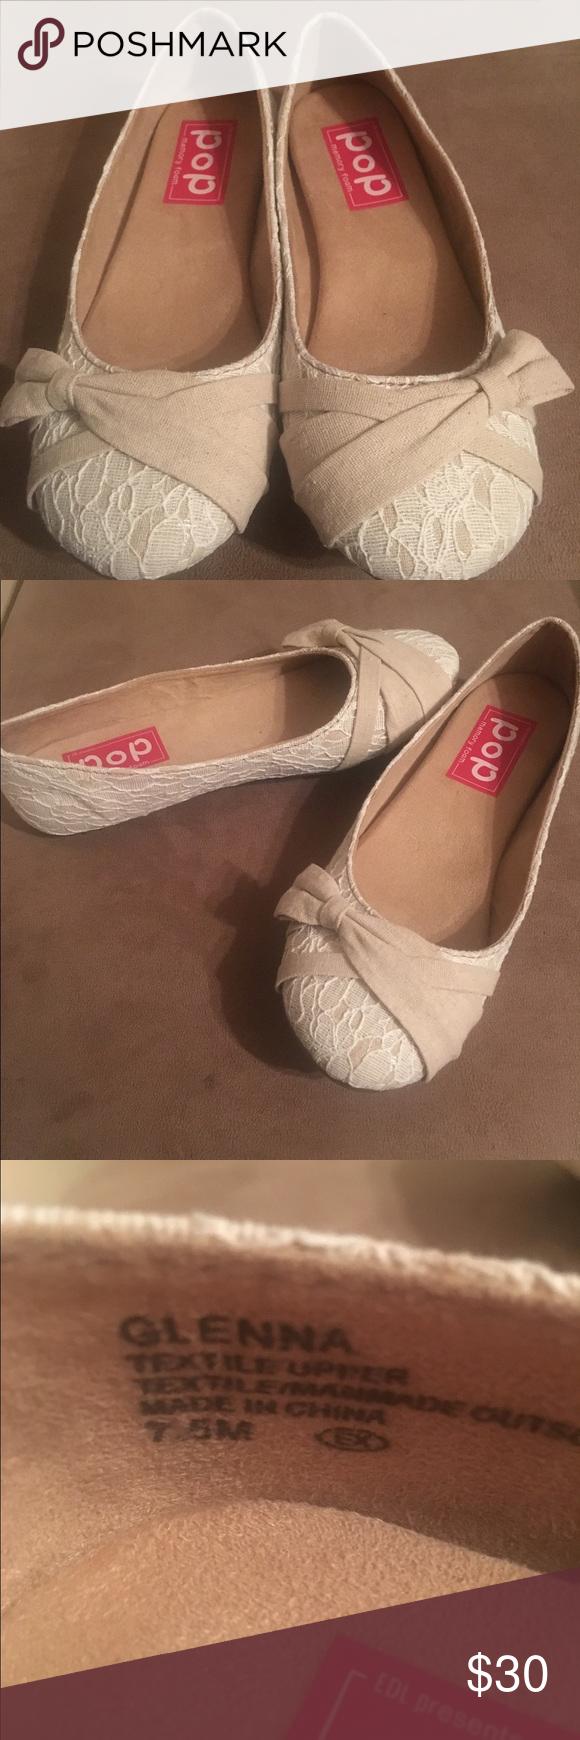 Beige cream flat shoes. Pop Glenna Natural Lace flats